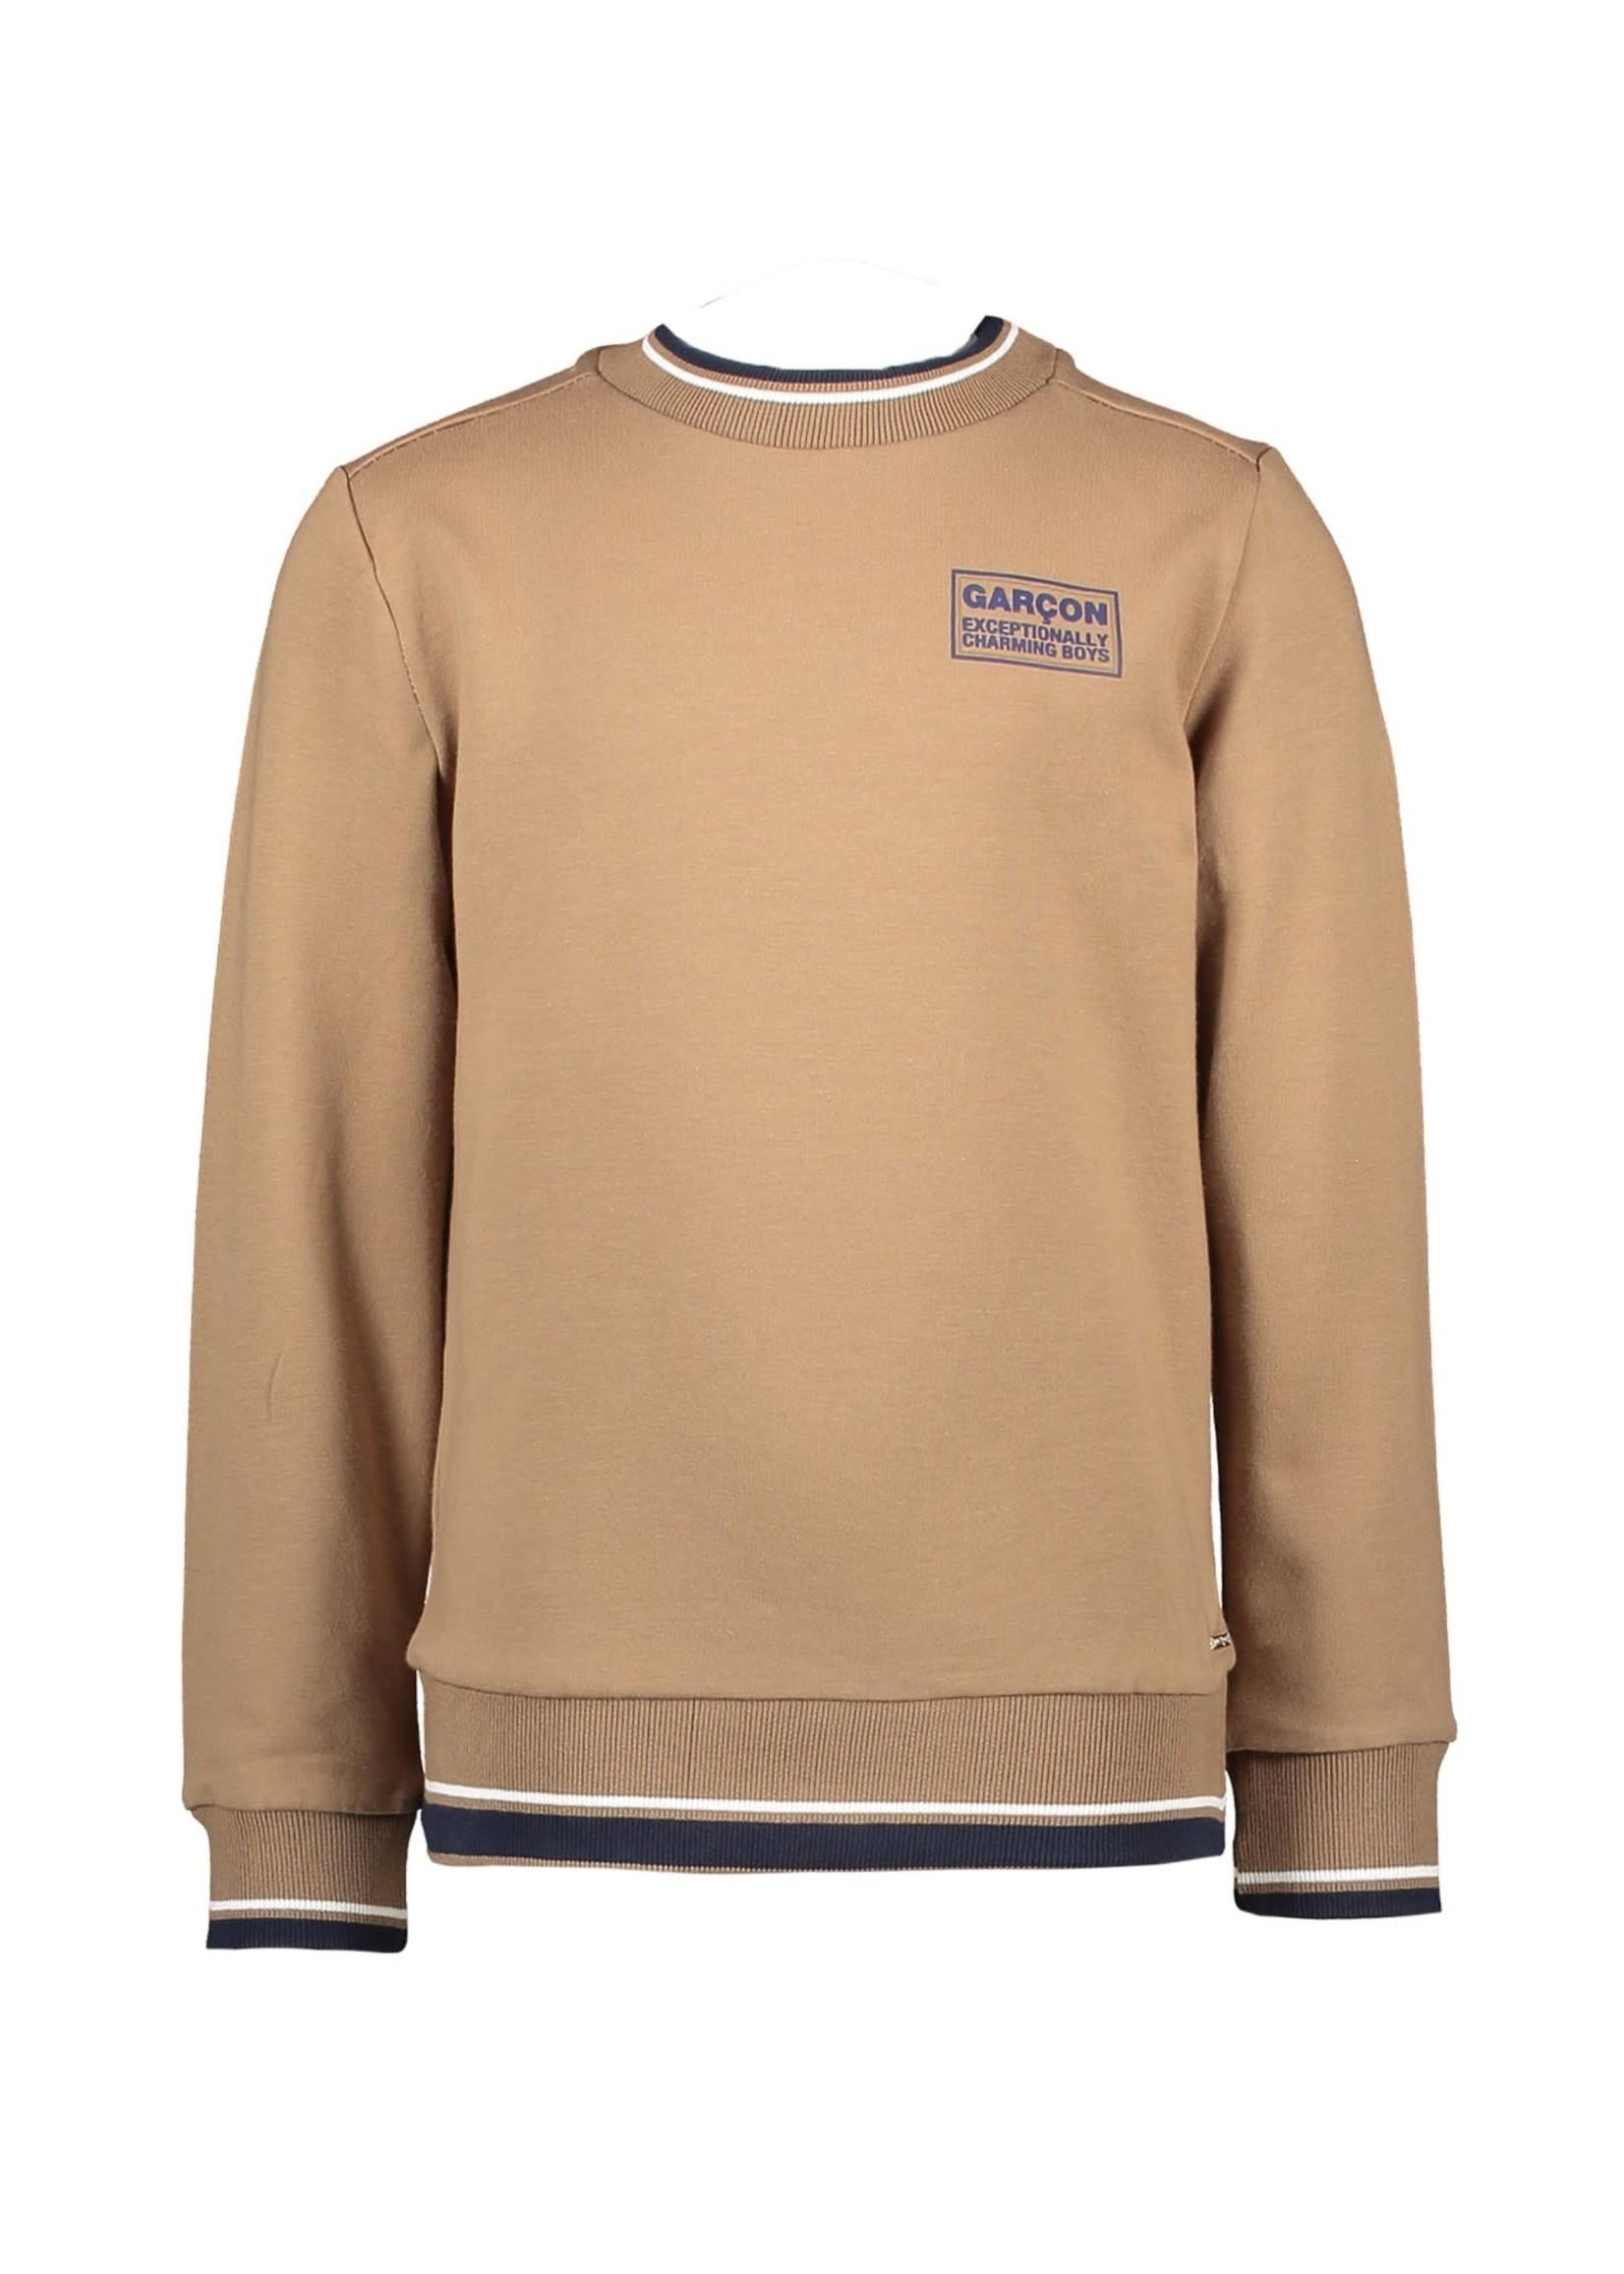 "Le Chic Garçon LE CHIC GARÇON Sweater ""Oliver""  small print bruin/beige"